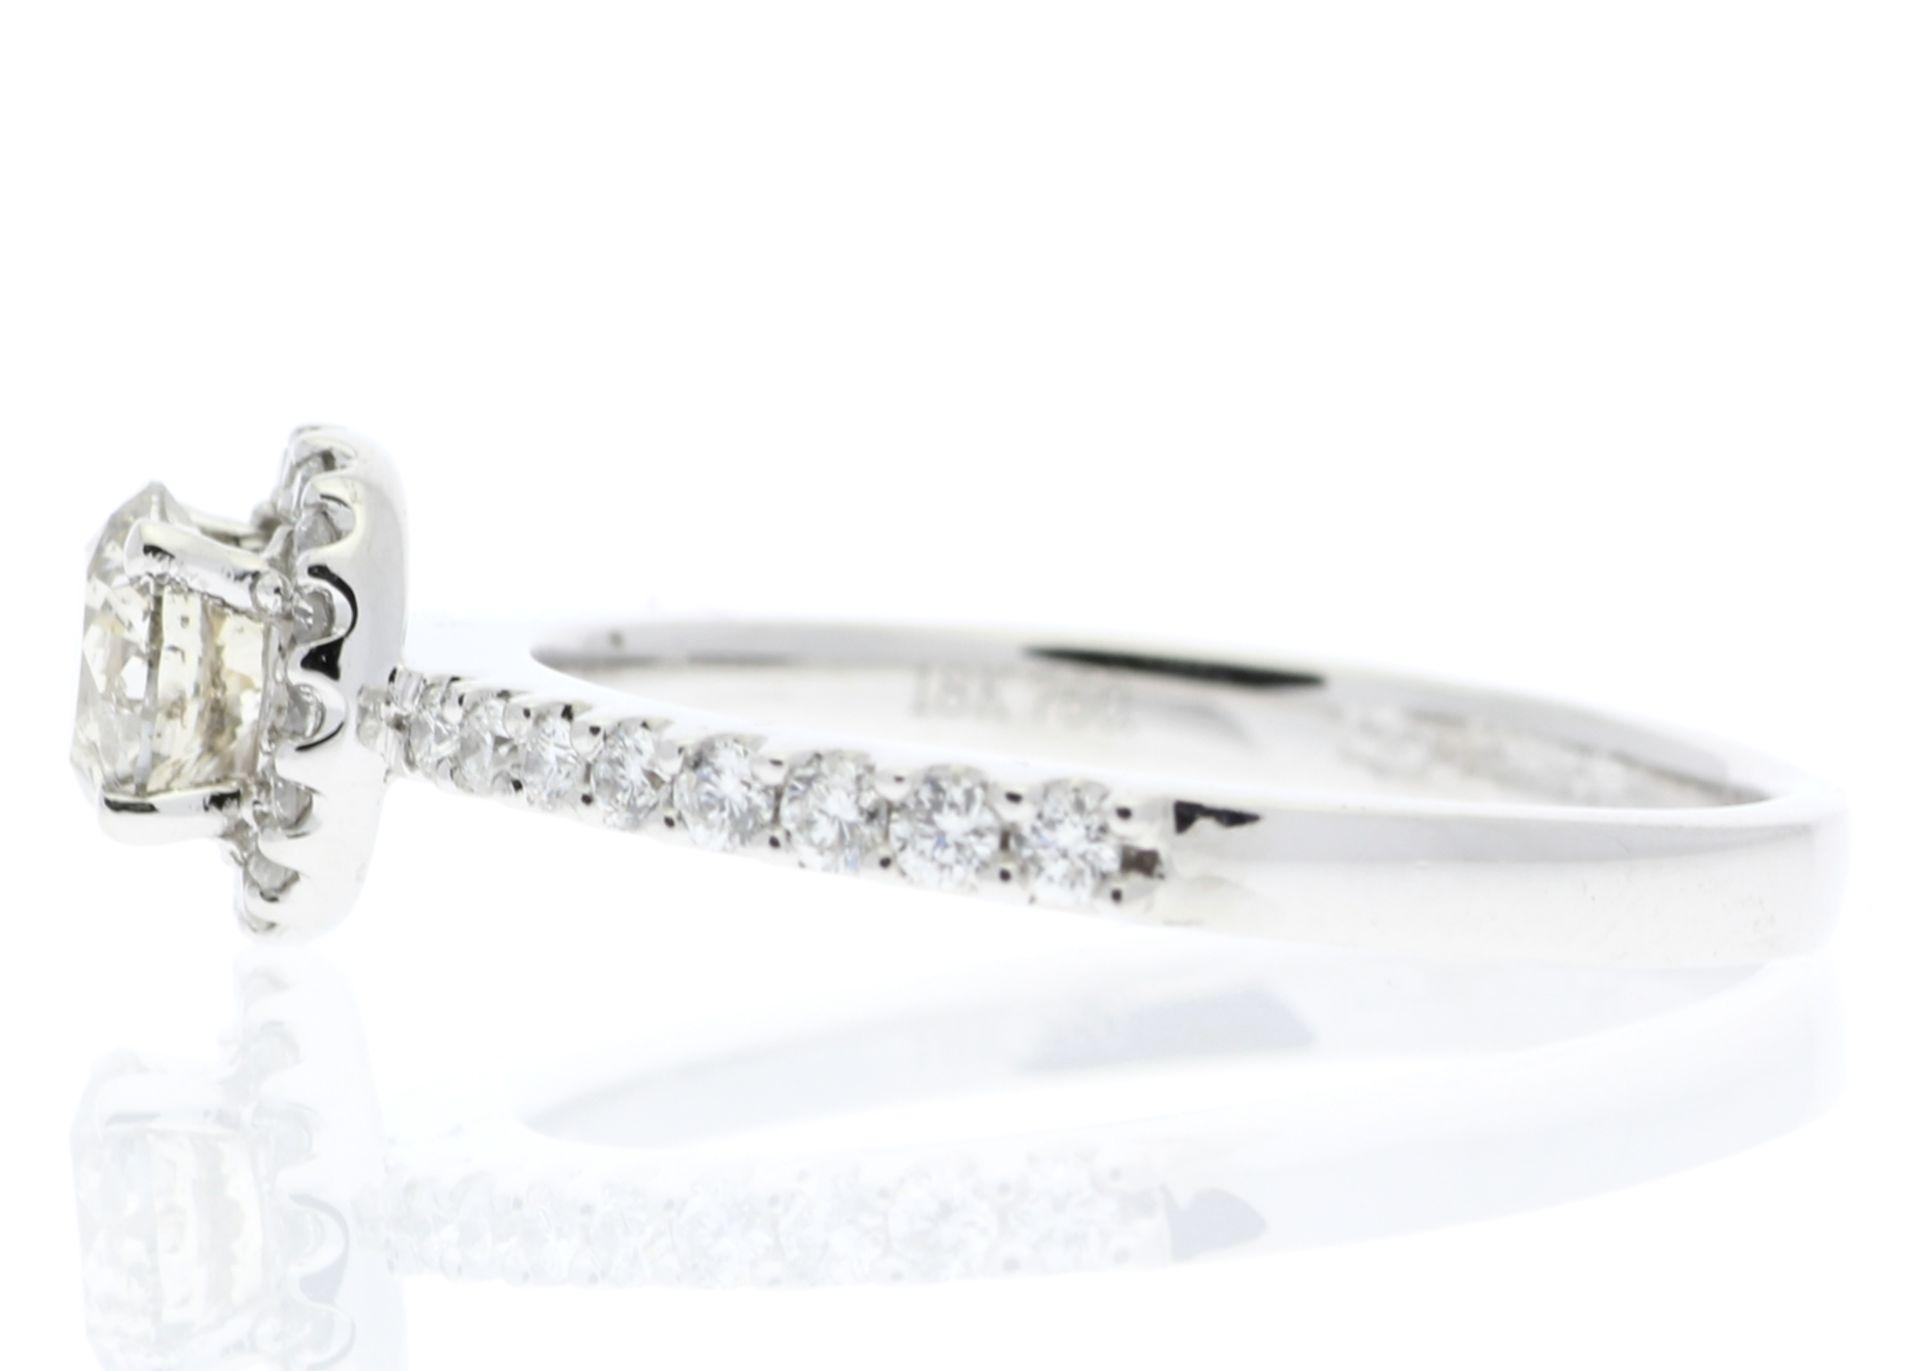 18ct White Gold Single Stone Halo Set With Stone Set Shoulders Diamond Ring (0.25) 0.52 Carats - - Image 3 of 4